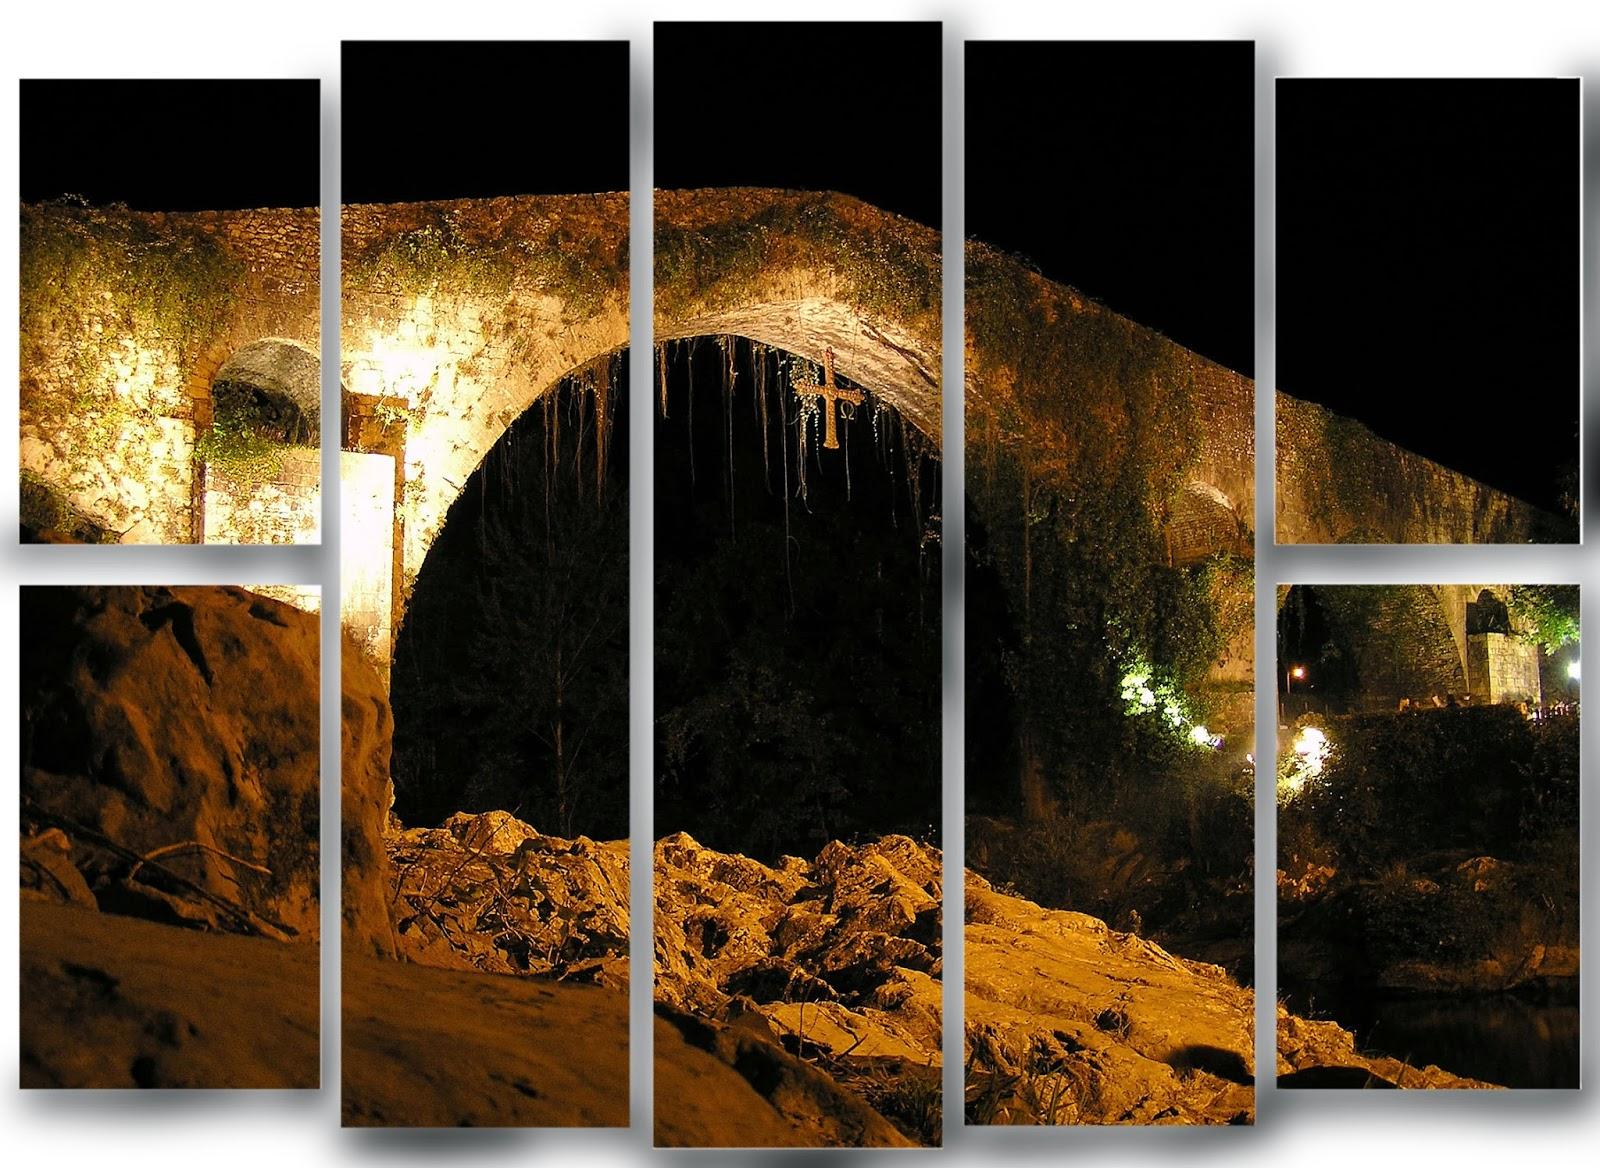 Aprendiz del Retoque Fotografico: Un sencillo Collage